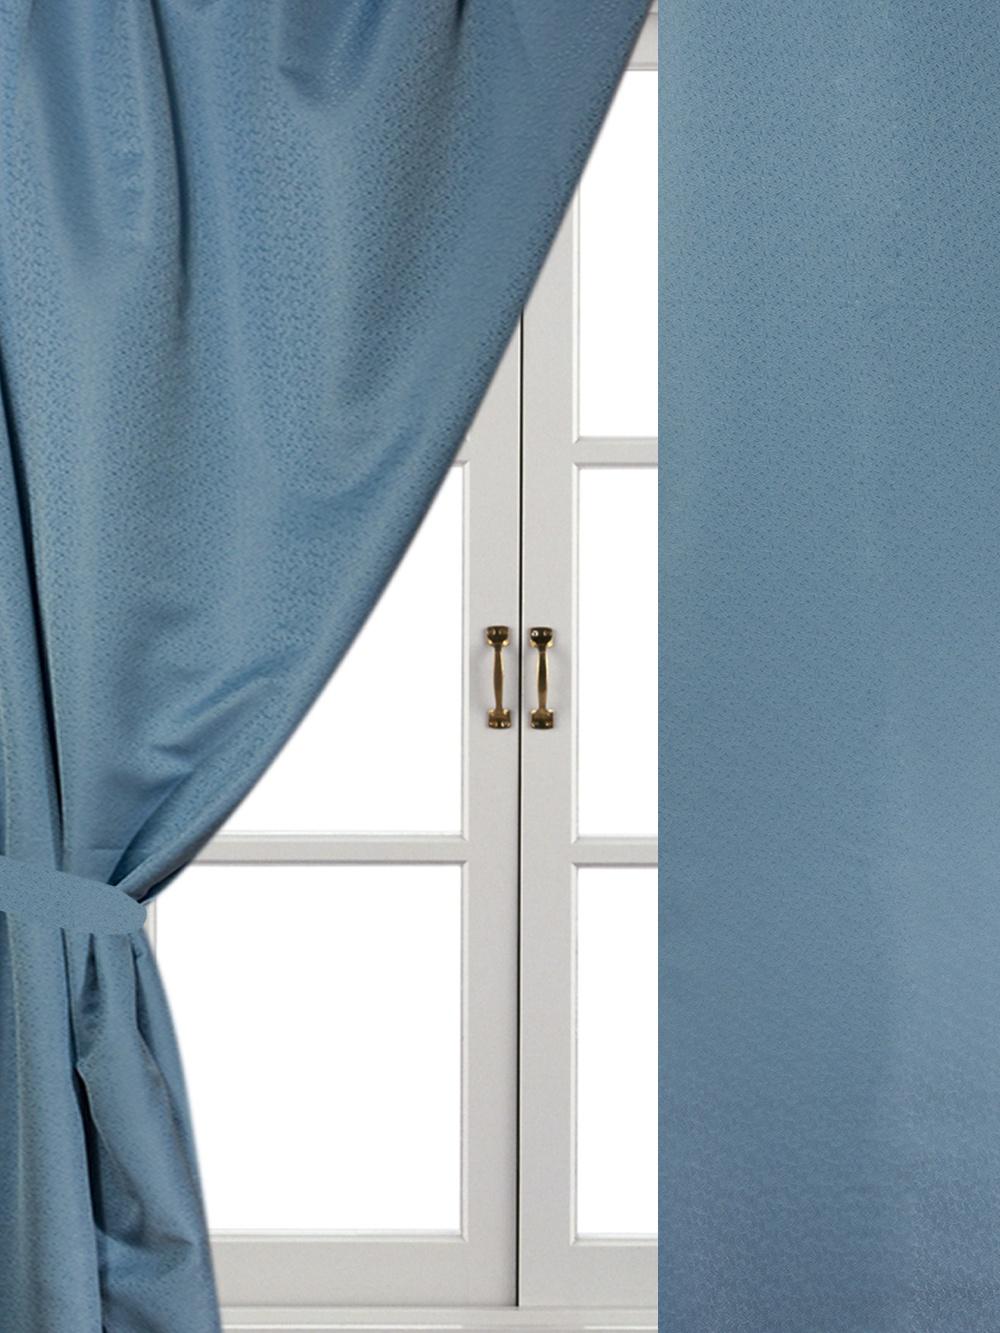 Шторы комнатные Айлант ОБ5 шторы homedeco нитяные шторы яркие кольца